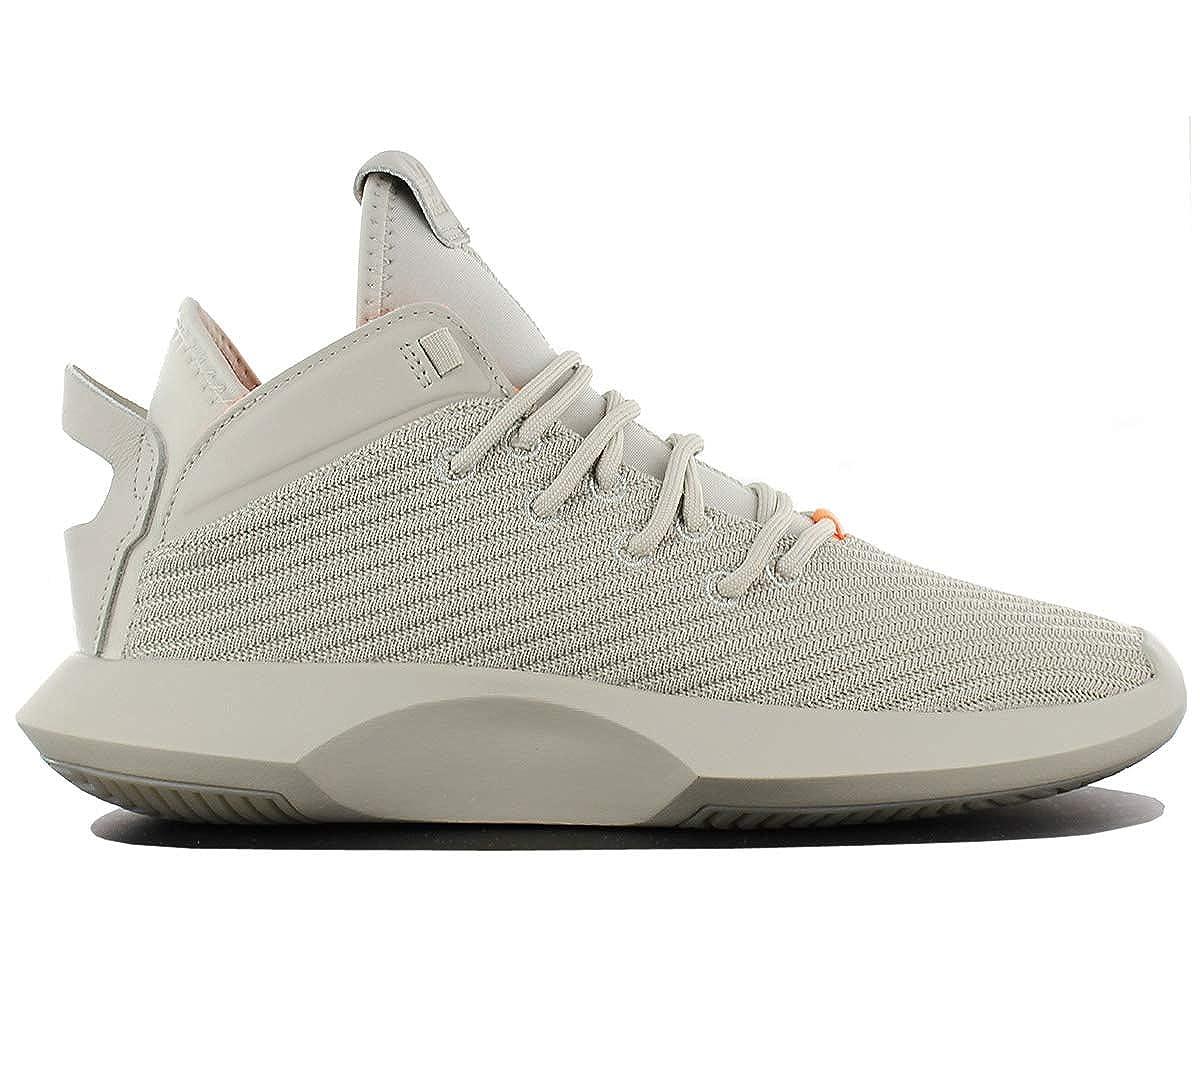 Adidas Originals Crazy 1 ADV CK Herren Schuhe Sesam Turnschuhe Turnschuhe Basketballschuhe Sportschuhe